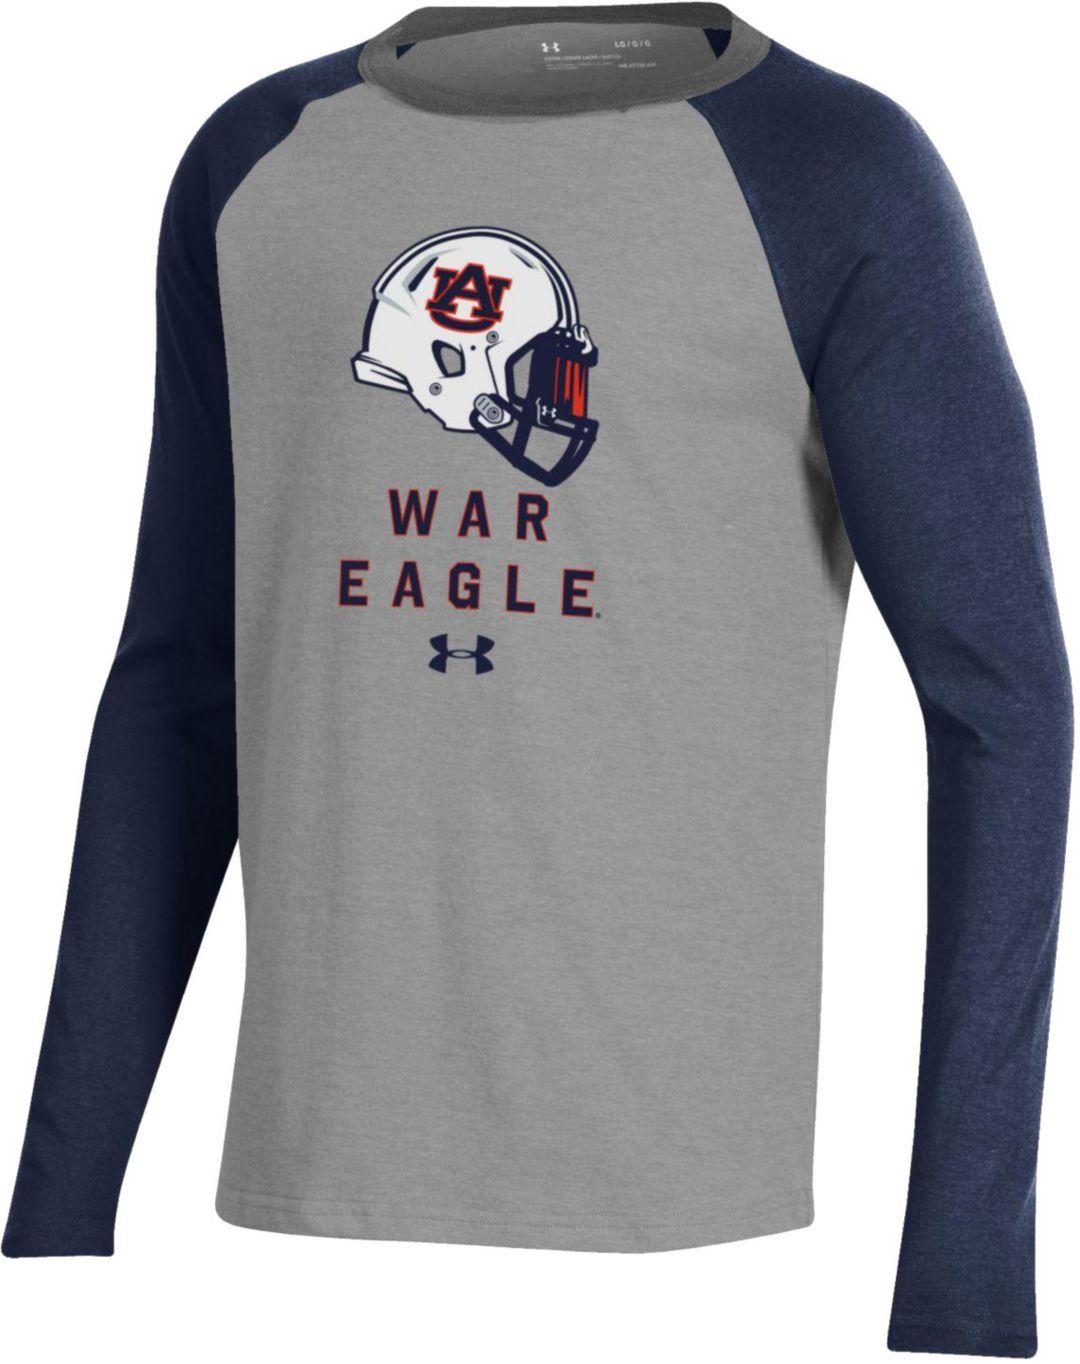 Under Armour Youth Auburn Tigers Grey Blue Performance Cotton Football T Shirt